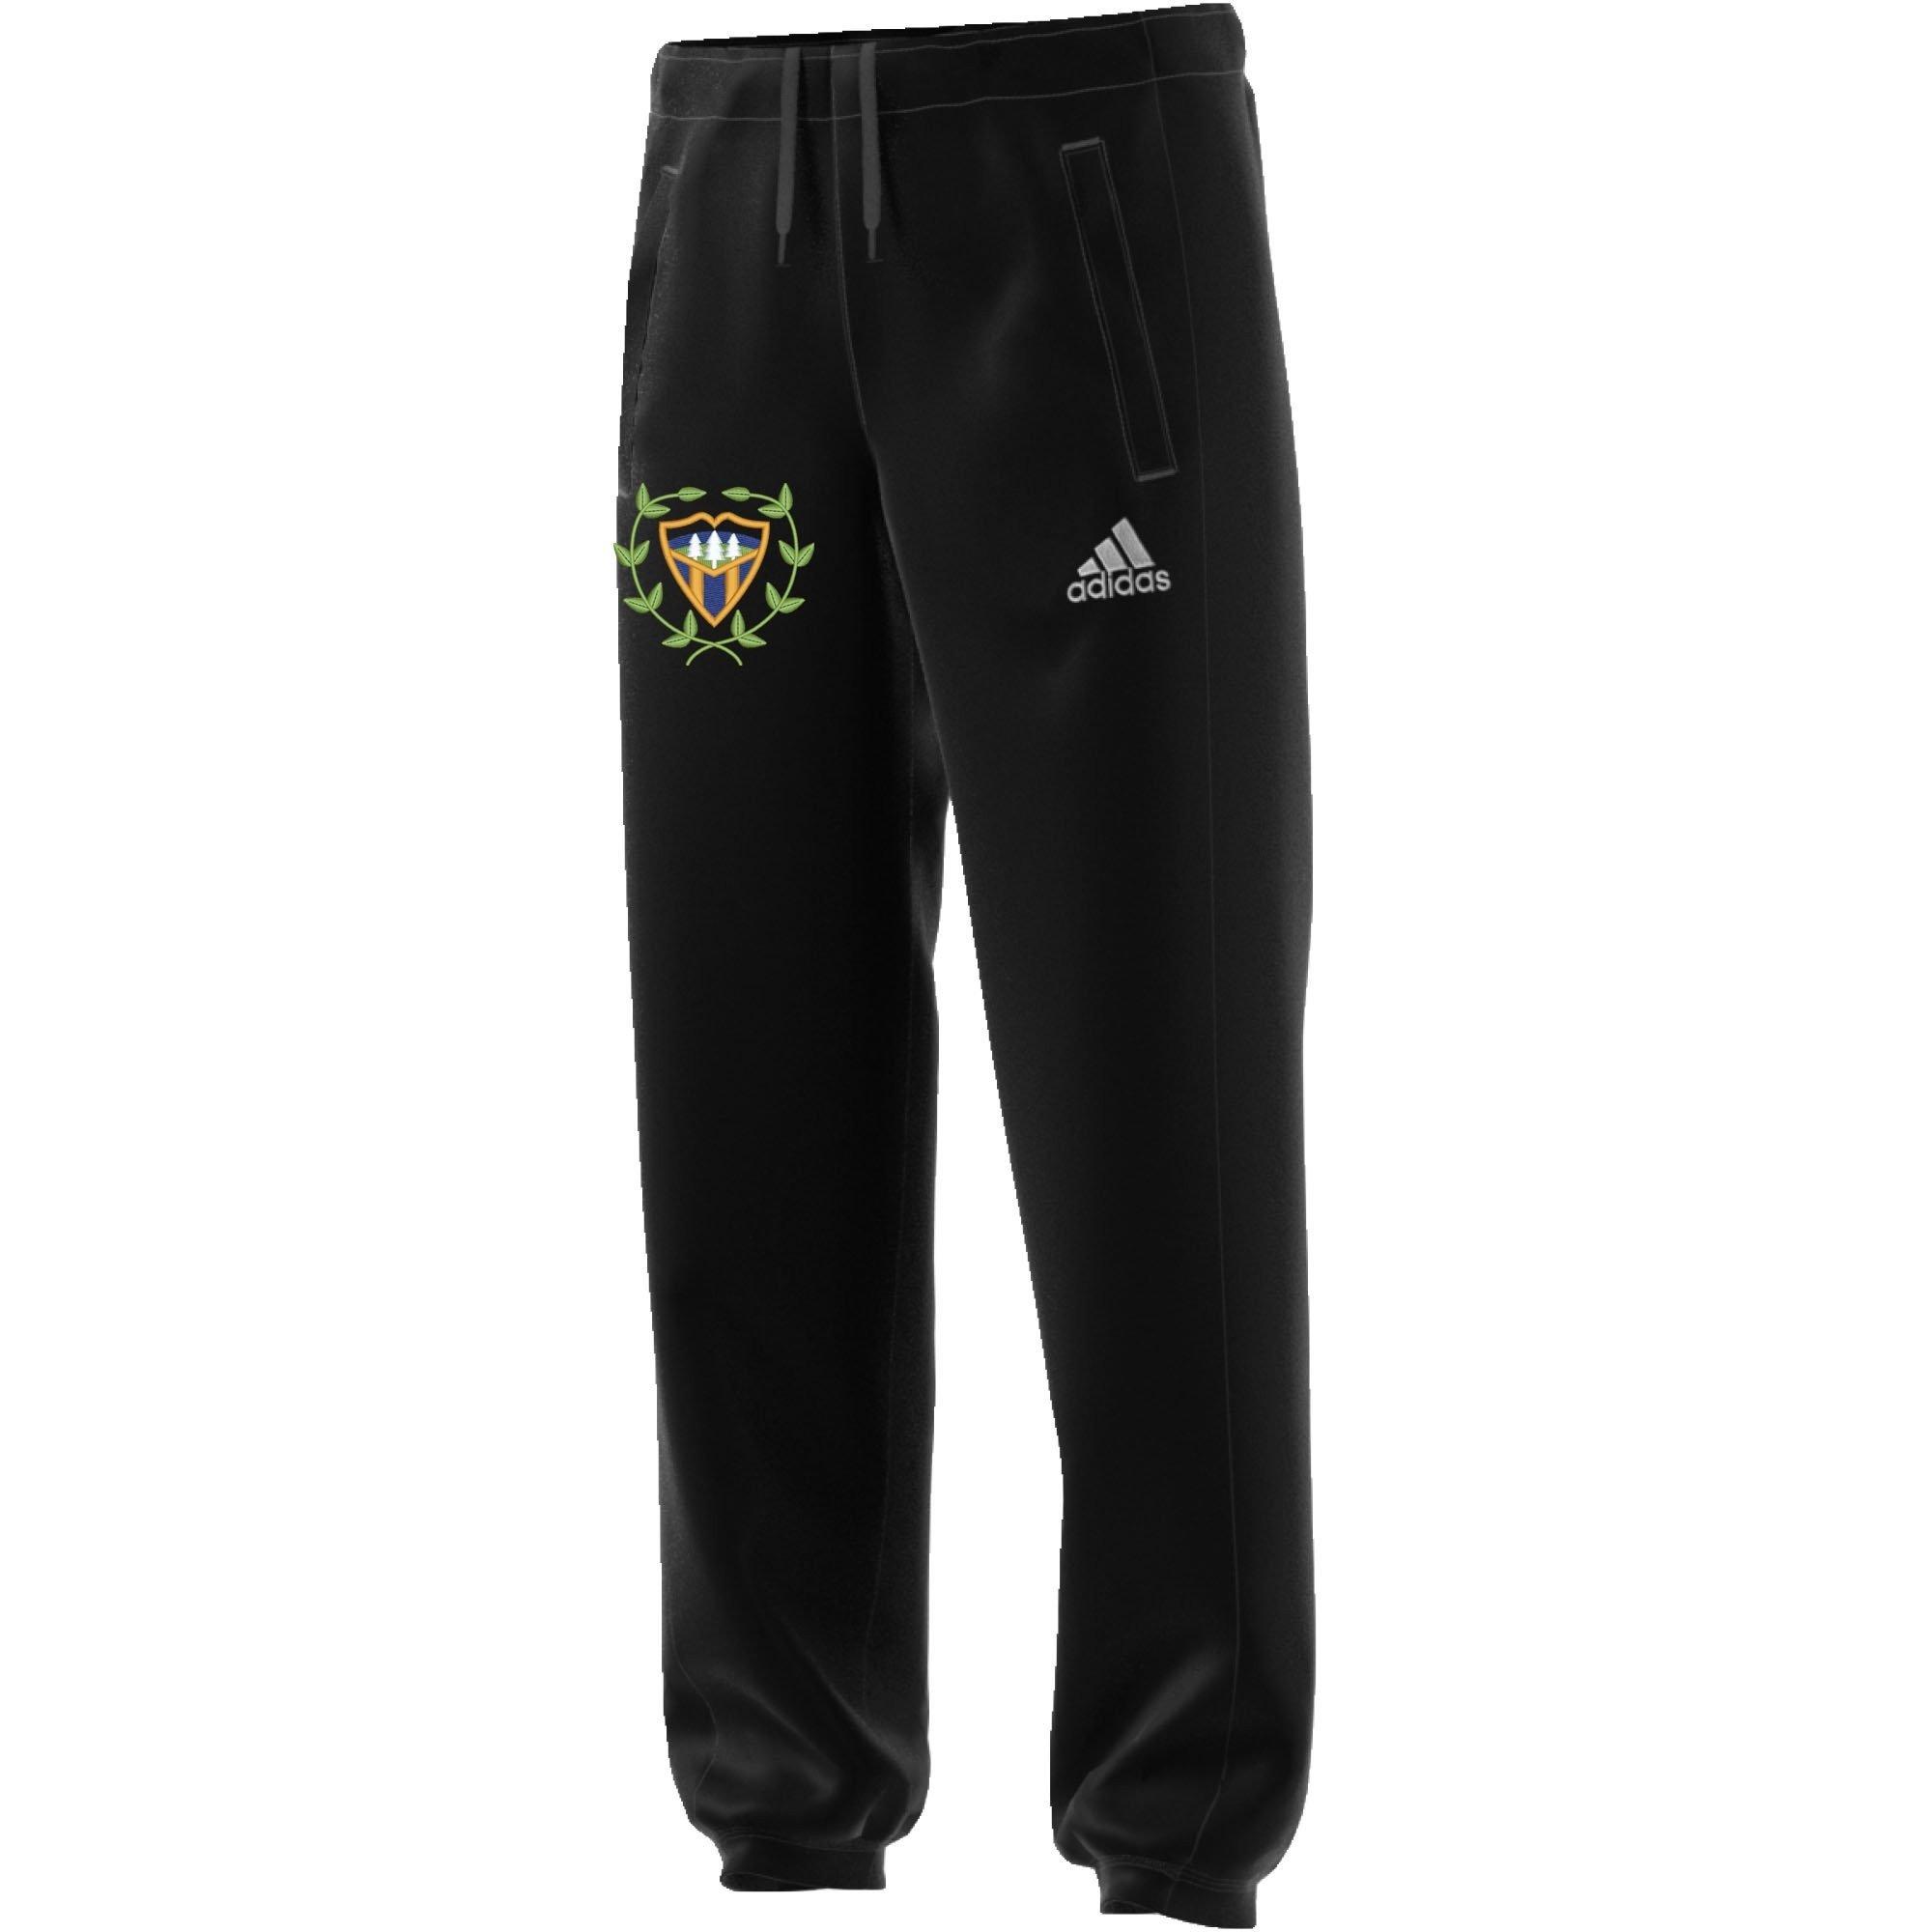 Woodvale CC Adidas Black Sweat Pants